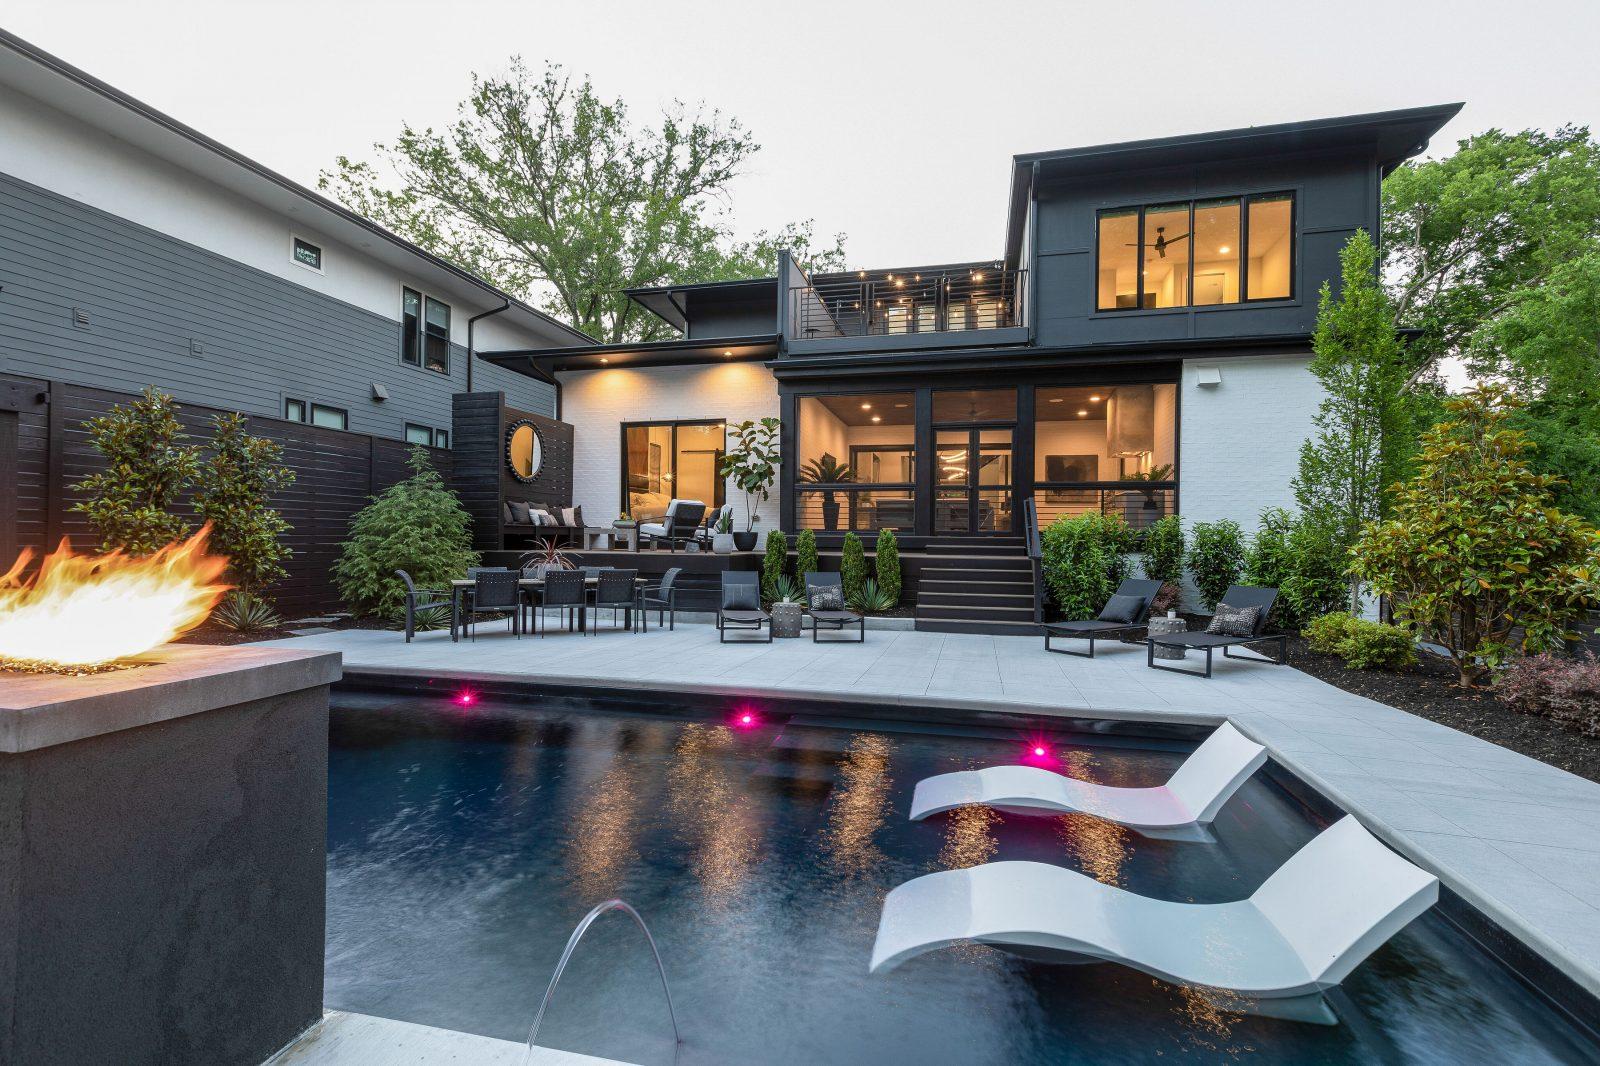 Cozy backyard pool getaway right outside of Nashville in Green Hills, TN